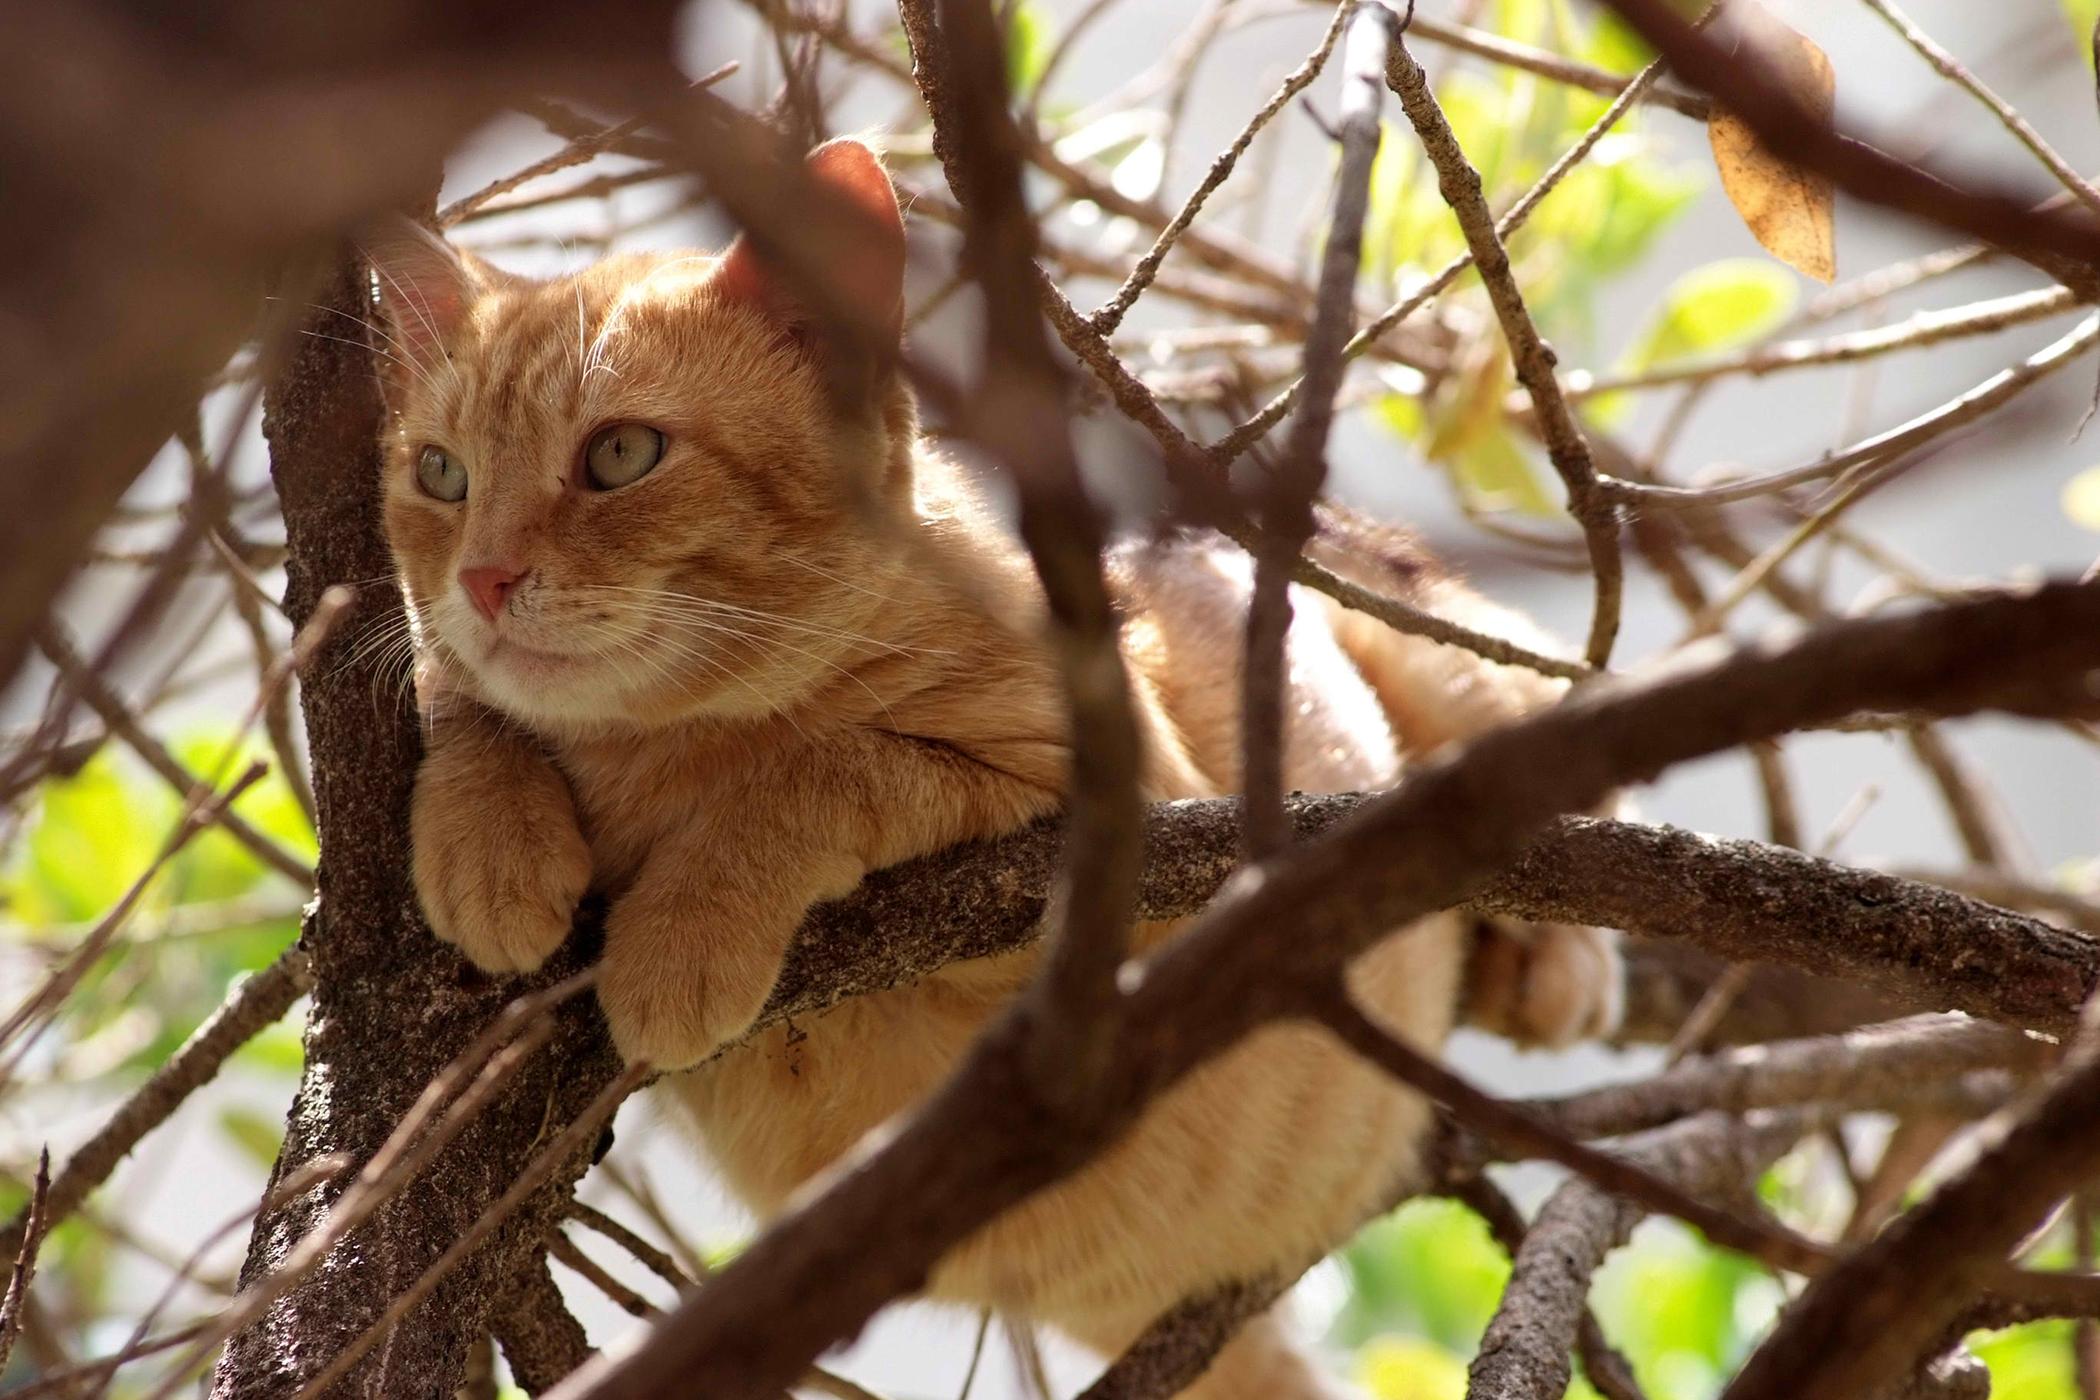 Pancreatic Exocrine Tumors in Cats